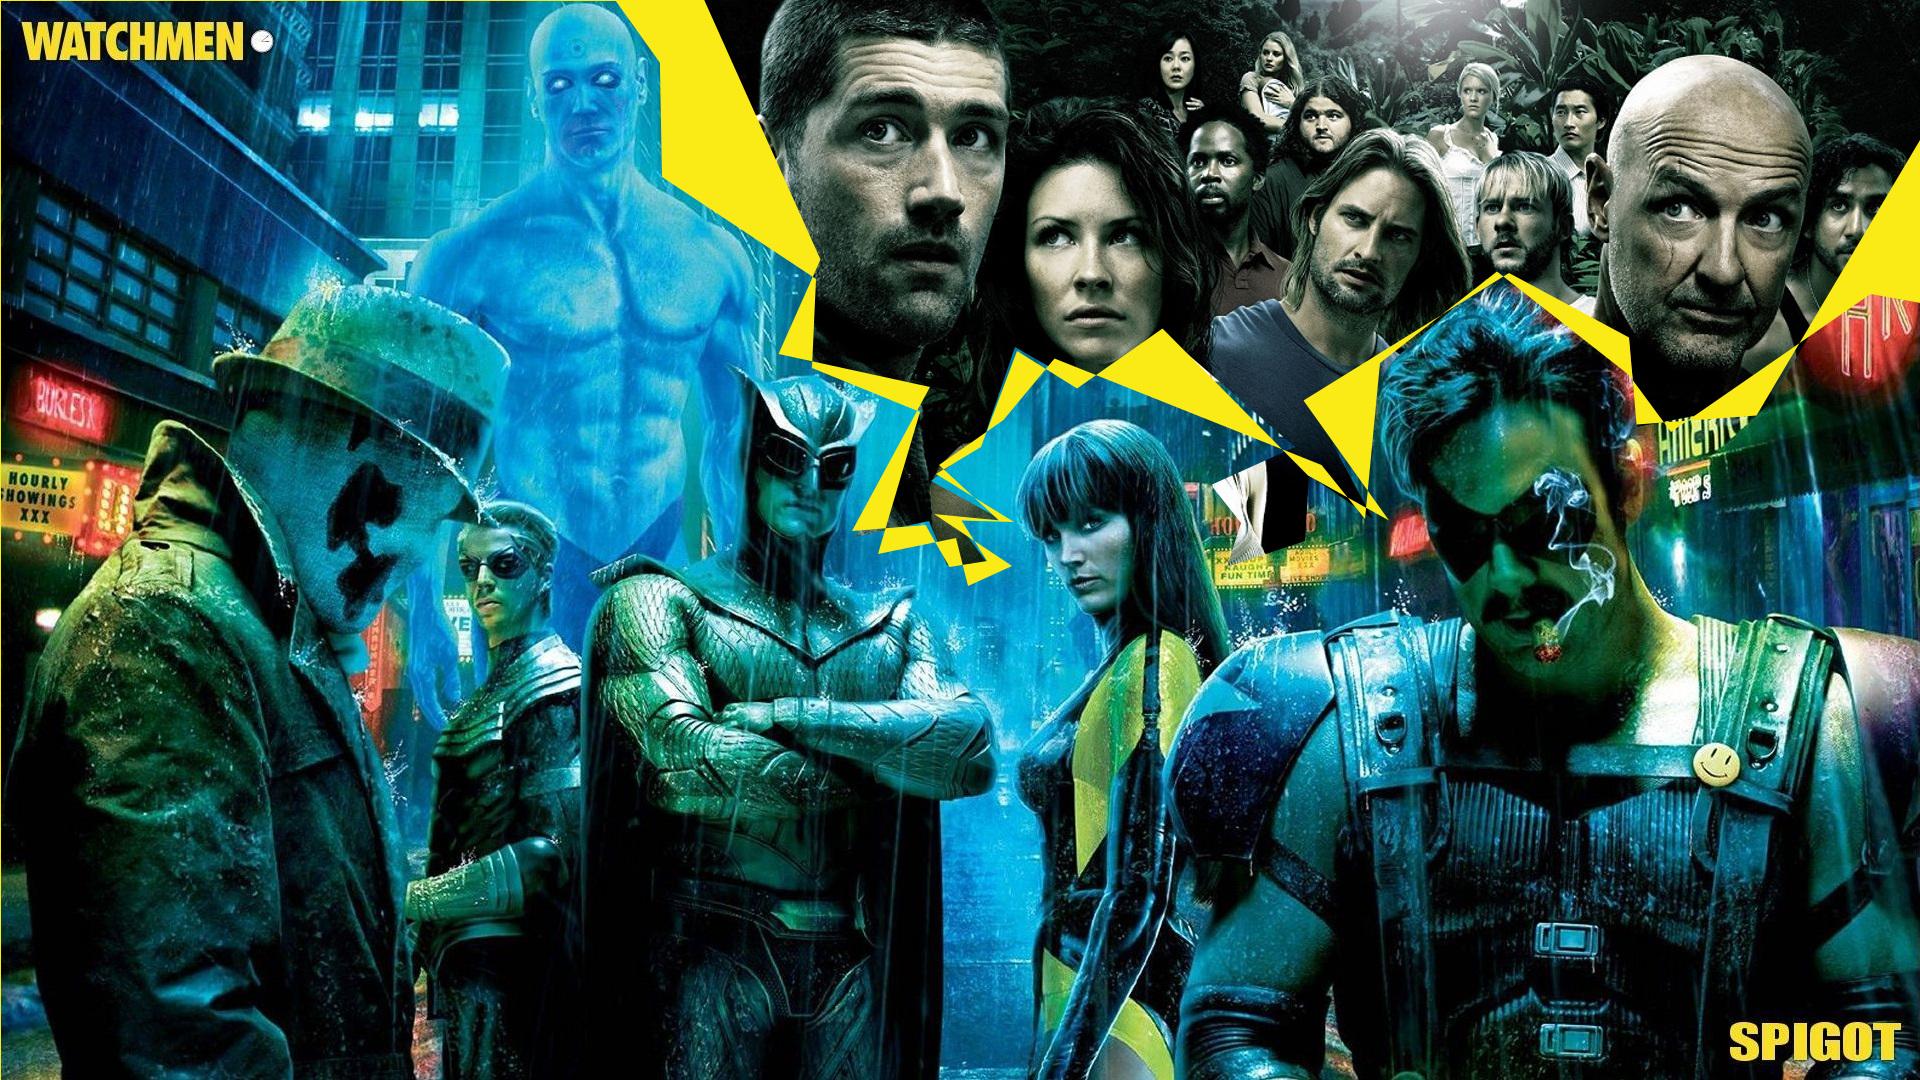 Confirmada serie de 'Watchmen' a cargo del creador de 'Perdidos'